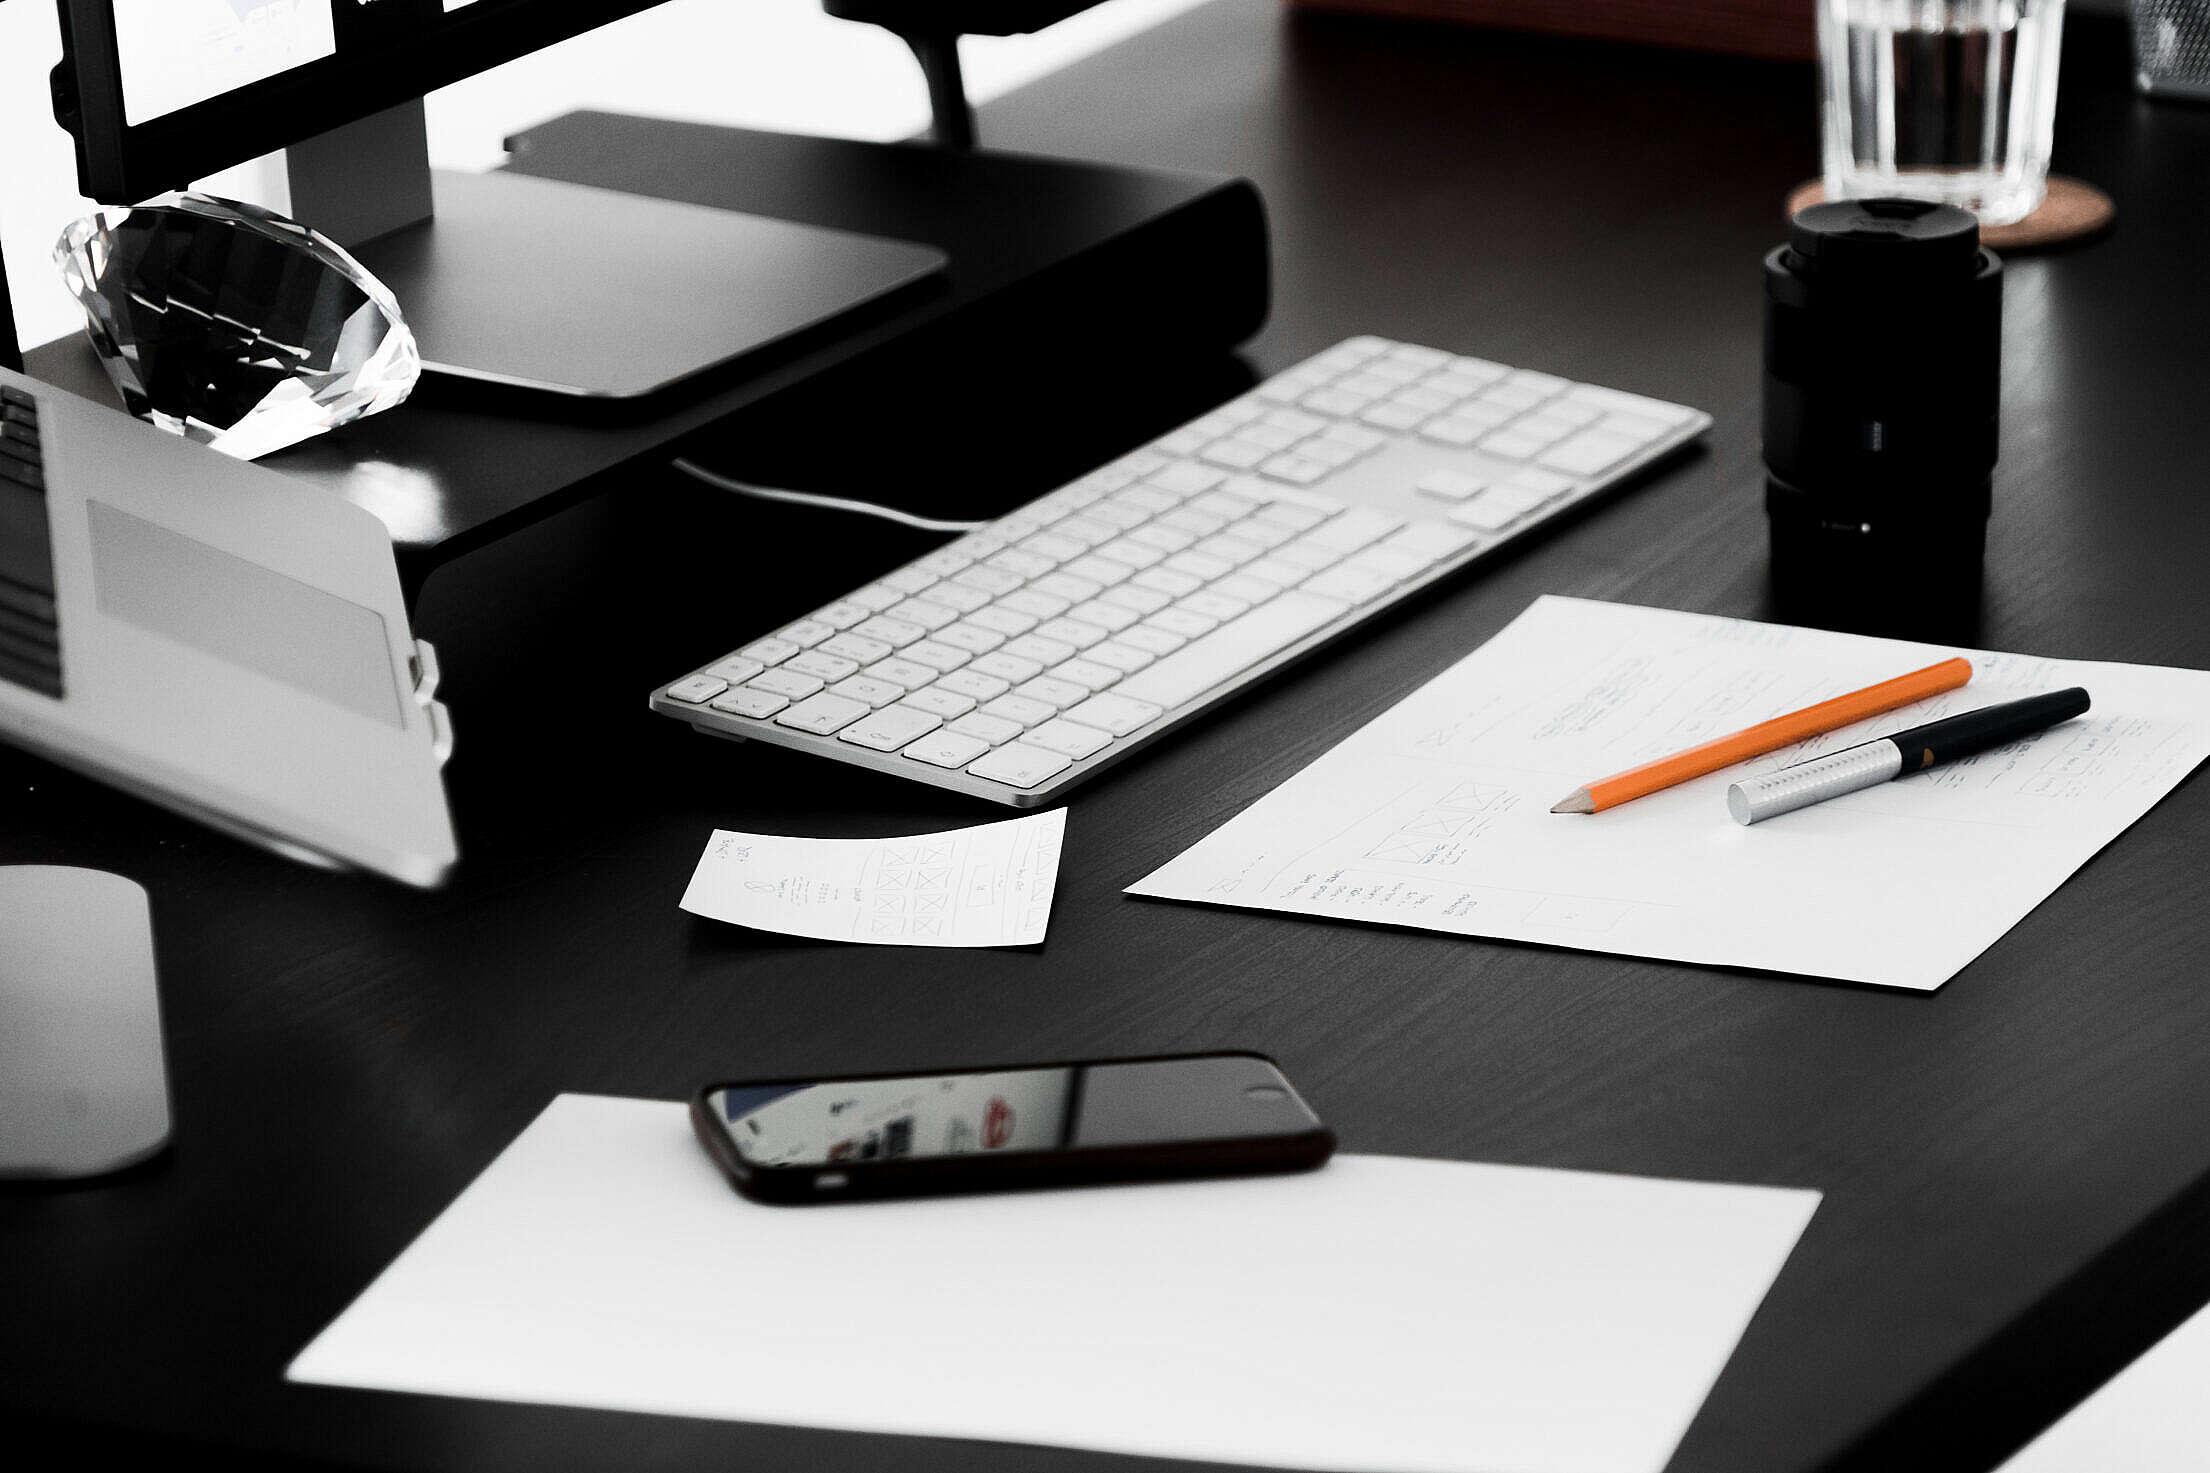 Busy Designer Minimalist Workplace Desk Free Stock Photo